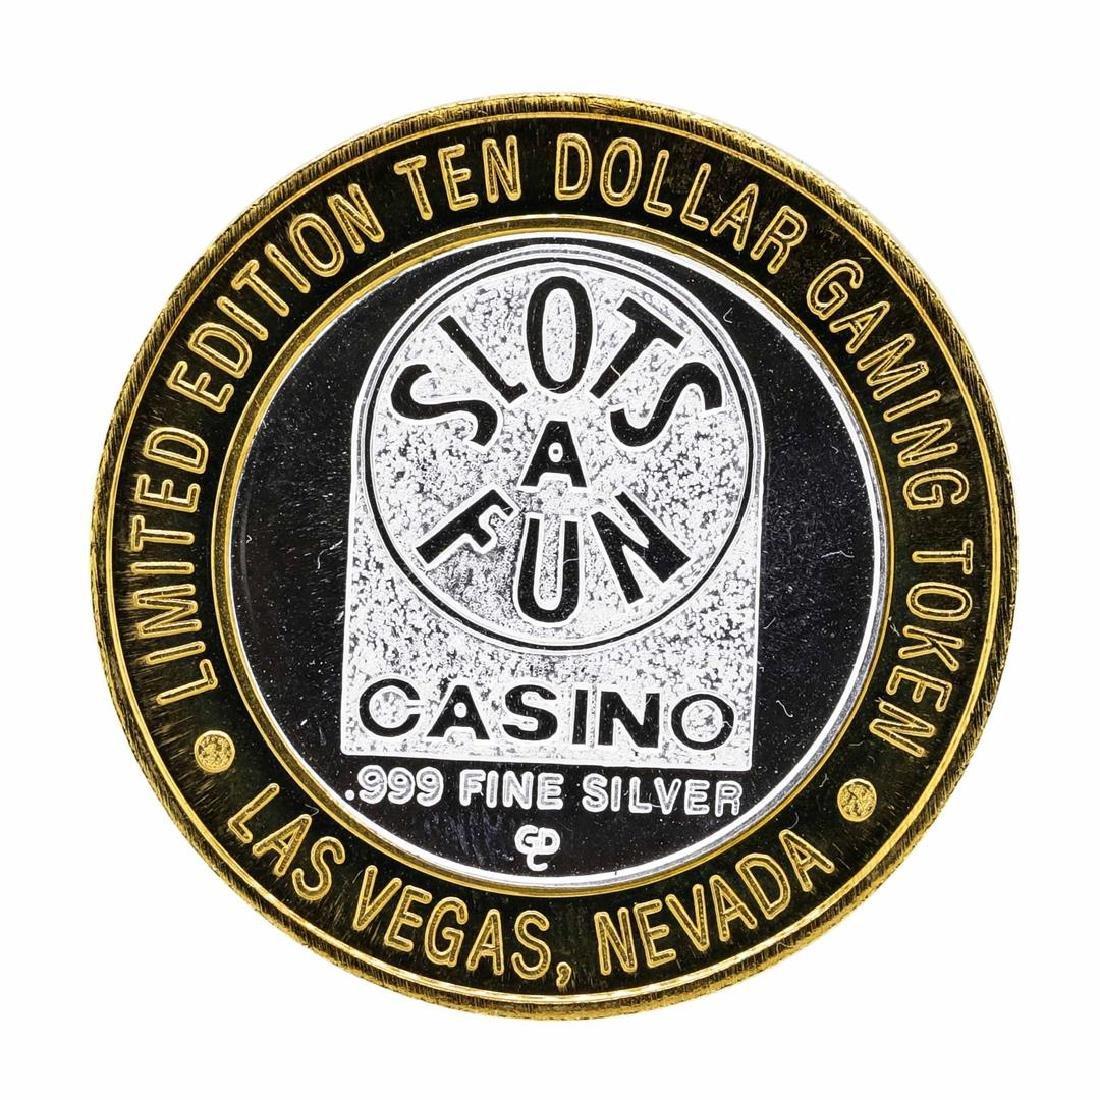 .999 Silver Slots - A - Fun Las Vegas, Nevada $10 - 2